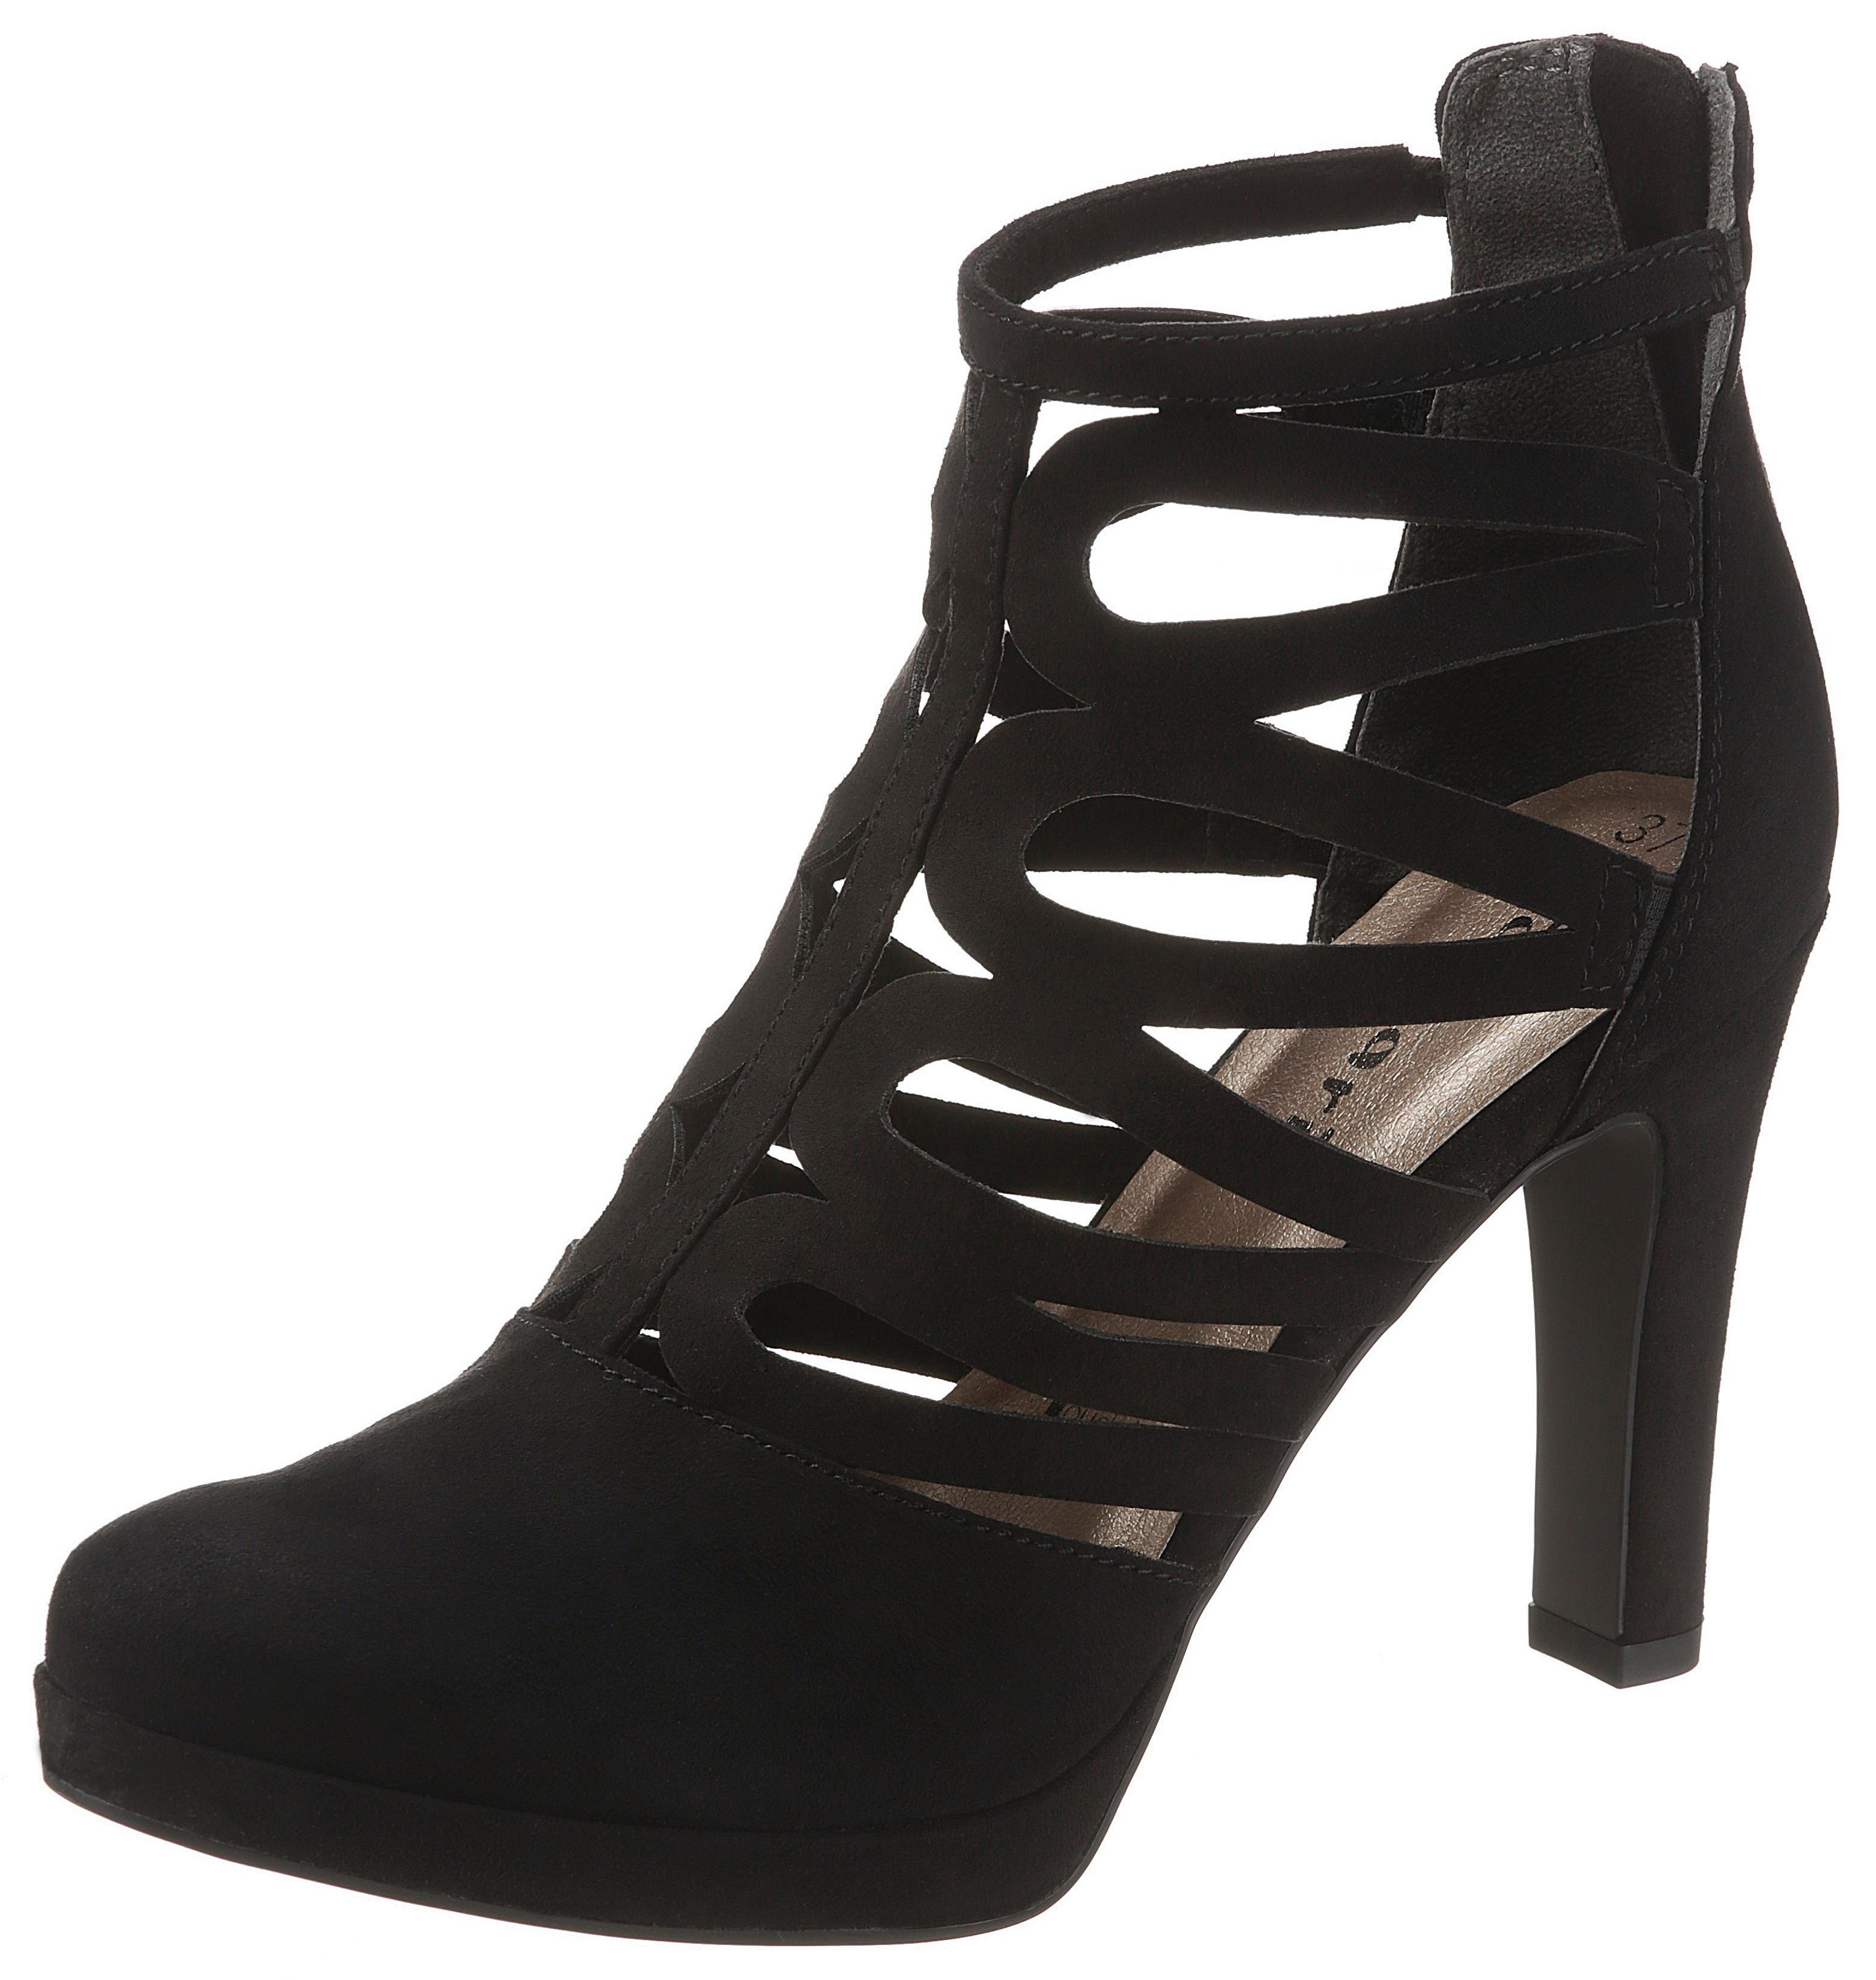 Tamaris High-Heel-Stiefelette | Schuhe > High Heels | Schwarz | Tamaris